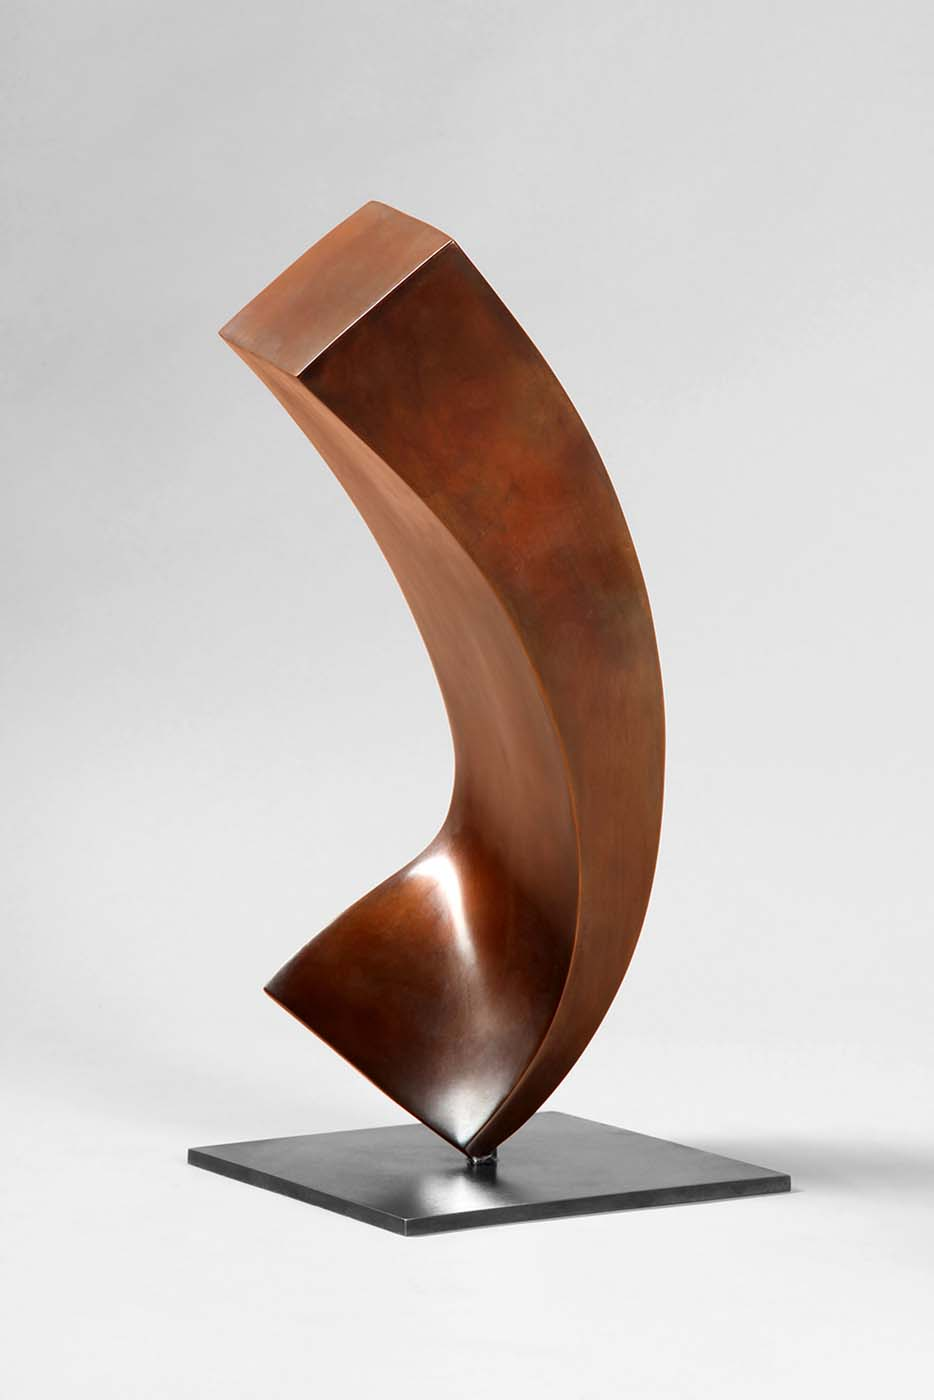 Erwartung, 2013, Bronze, 30 x 10 x 13 cm